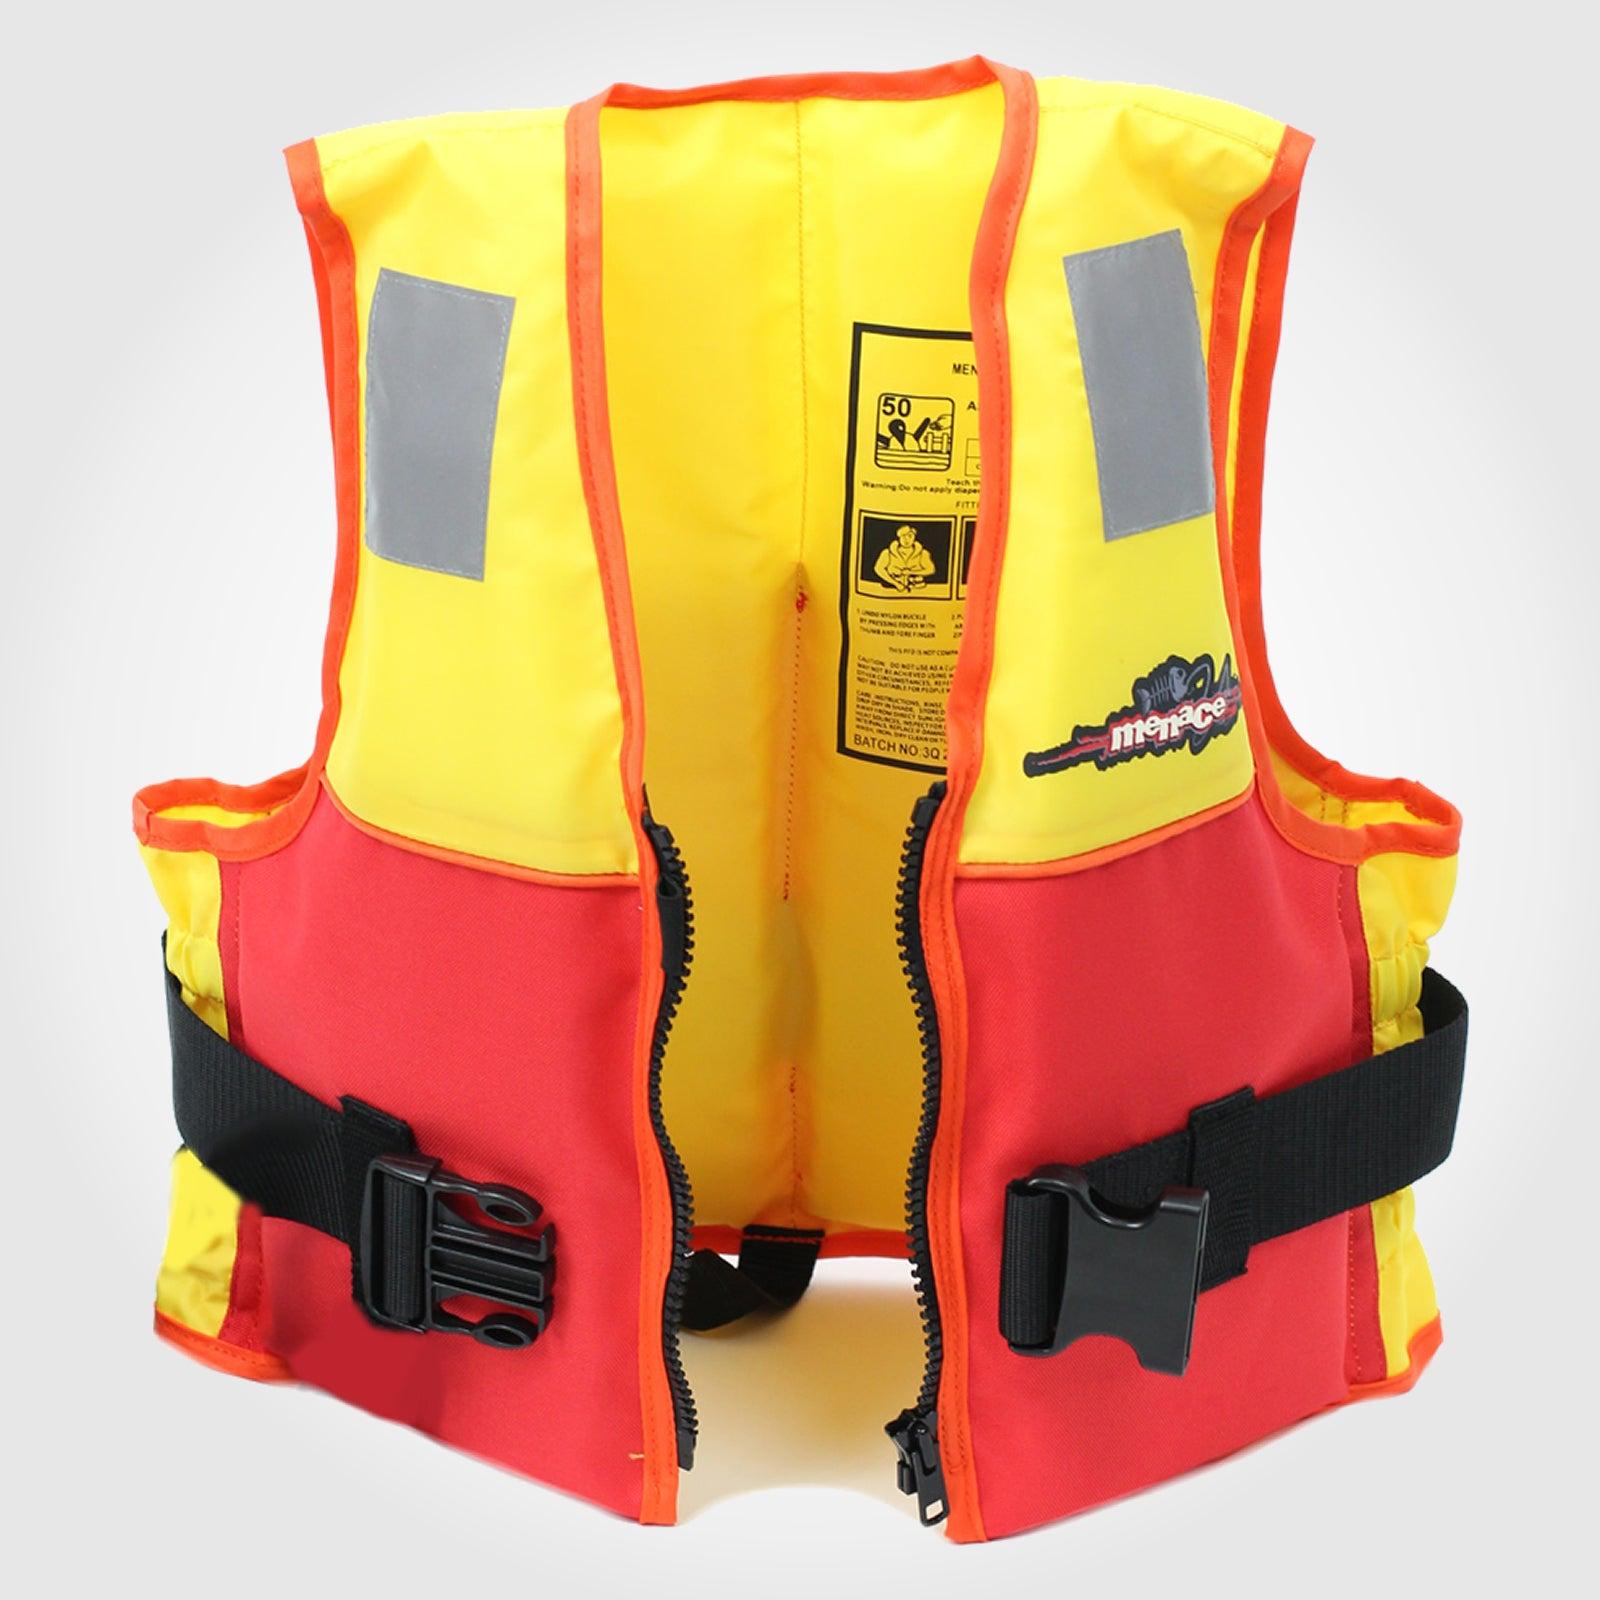 ADULT LARGE Life Jacket PFD Water Jet Ski Kayak Foam Lifejacket Type 2 Level 50